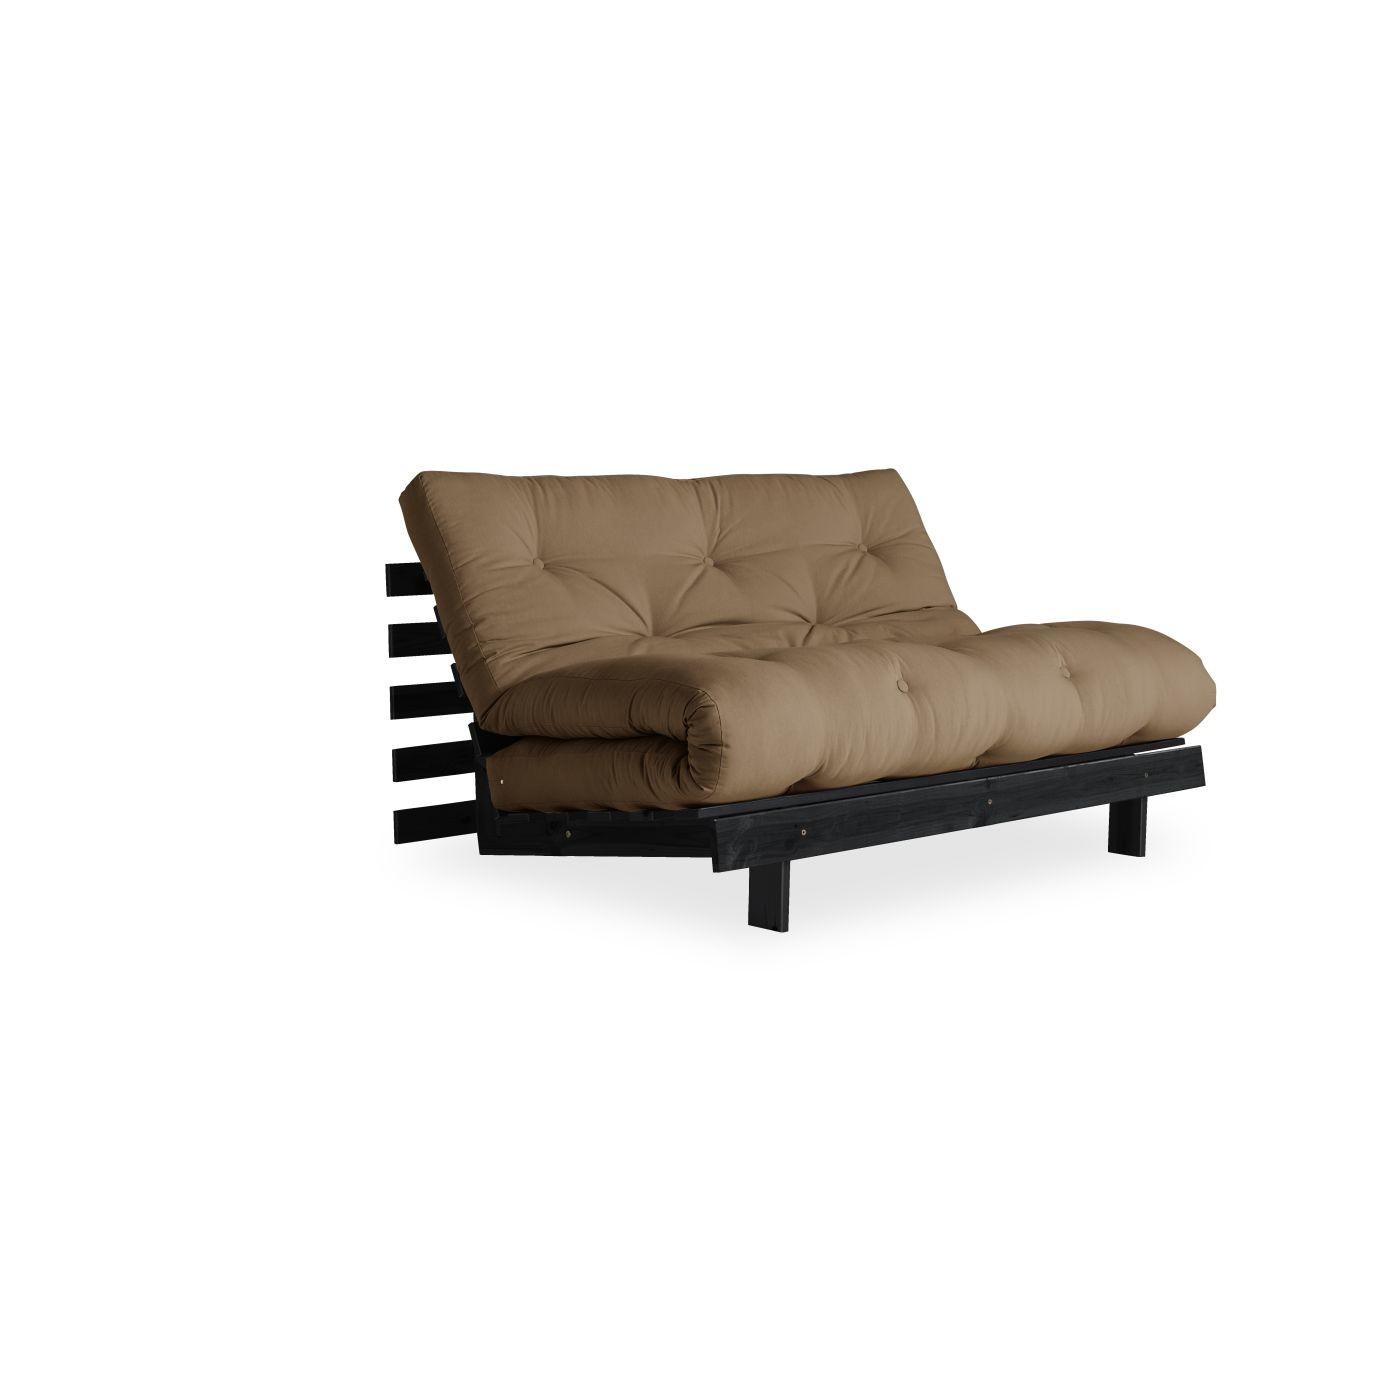 schlafsofa roots inkl futonmatratze liegefl che 140x200. Black Bedroom Furniture Sets. Home Design Ideas